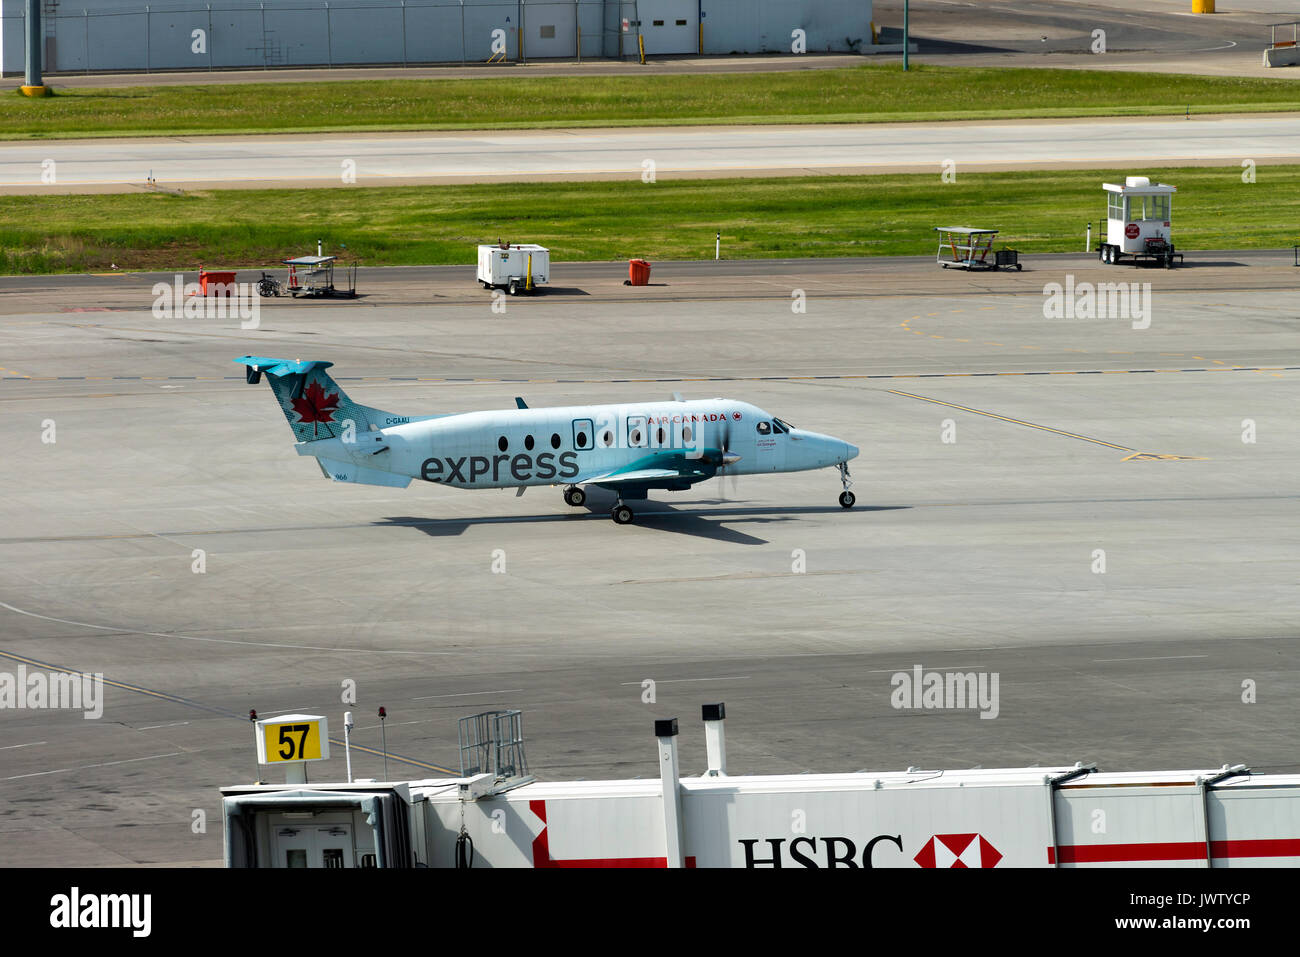 Air Canada Express Airline Beechcraft 1900D Airliner C-GAAU Taxiing at Calgary International Airport Alberta Canada - Stock Image